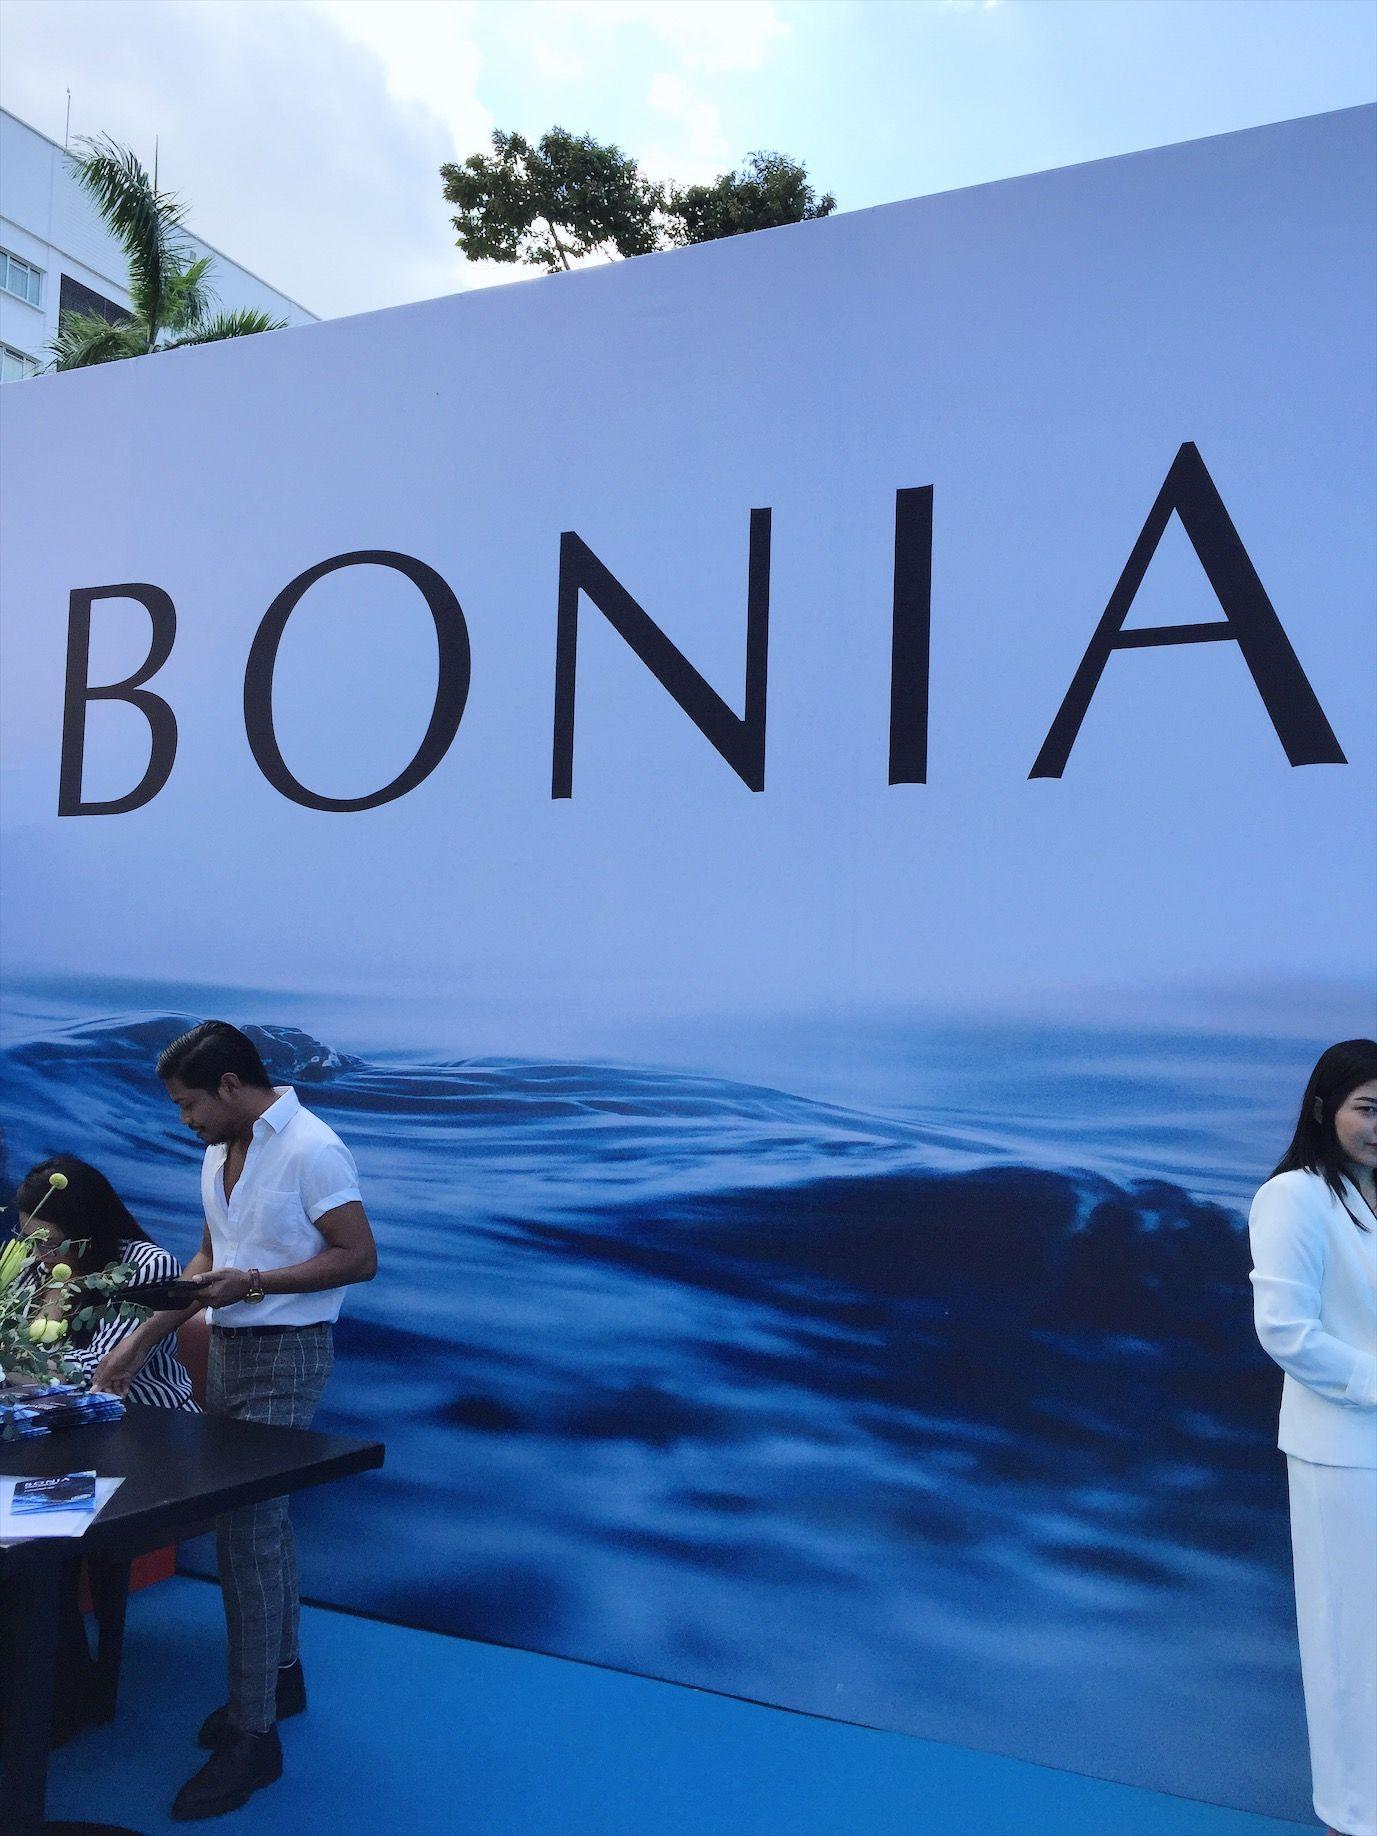 Selebrasi 45 Tahun BONIA di KL & Koleksi Spring/Summer 2020: Isole